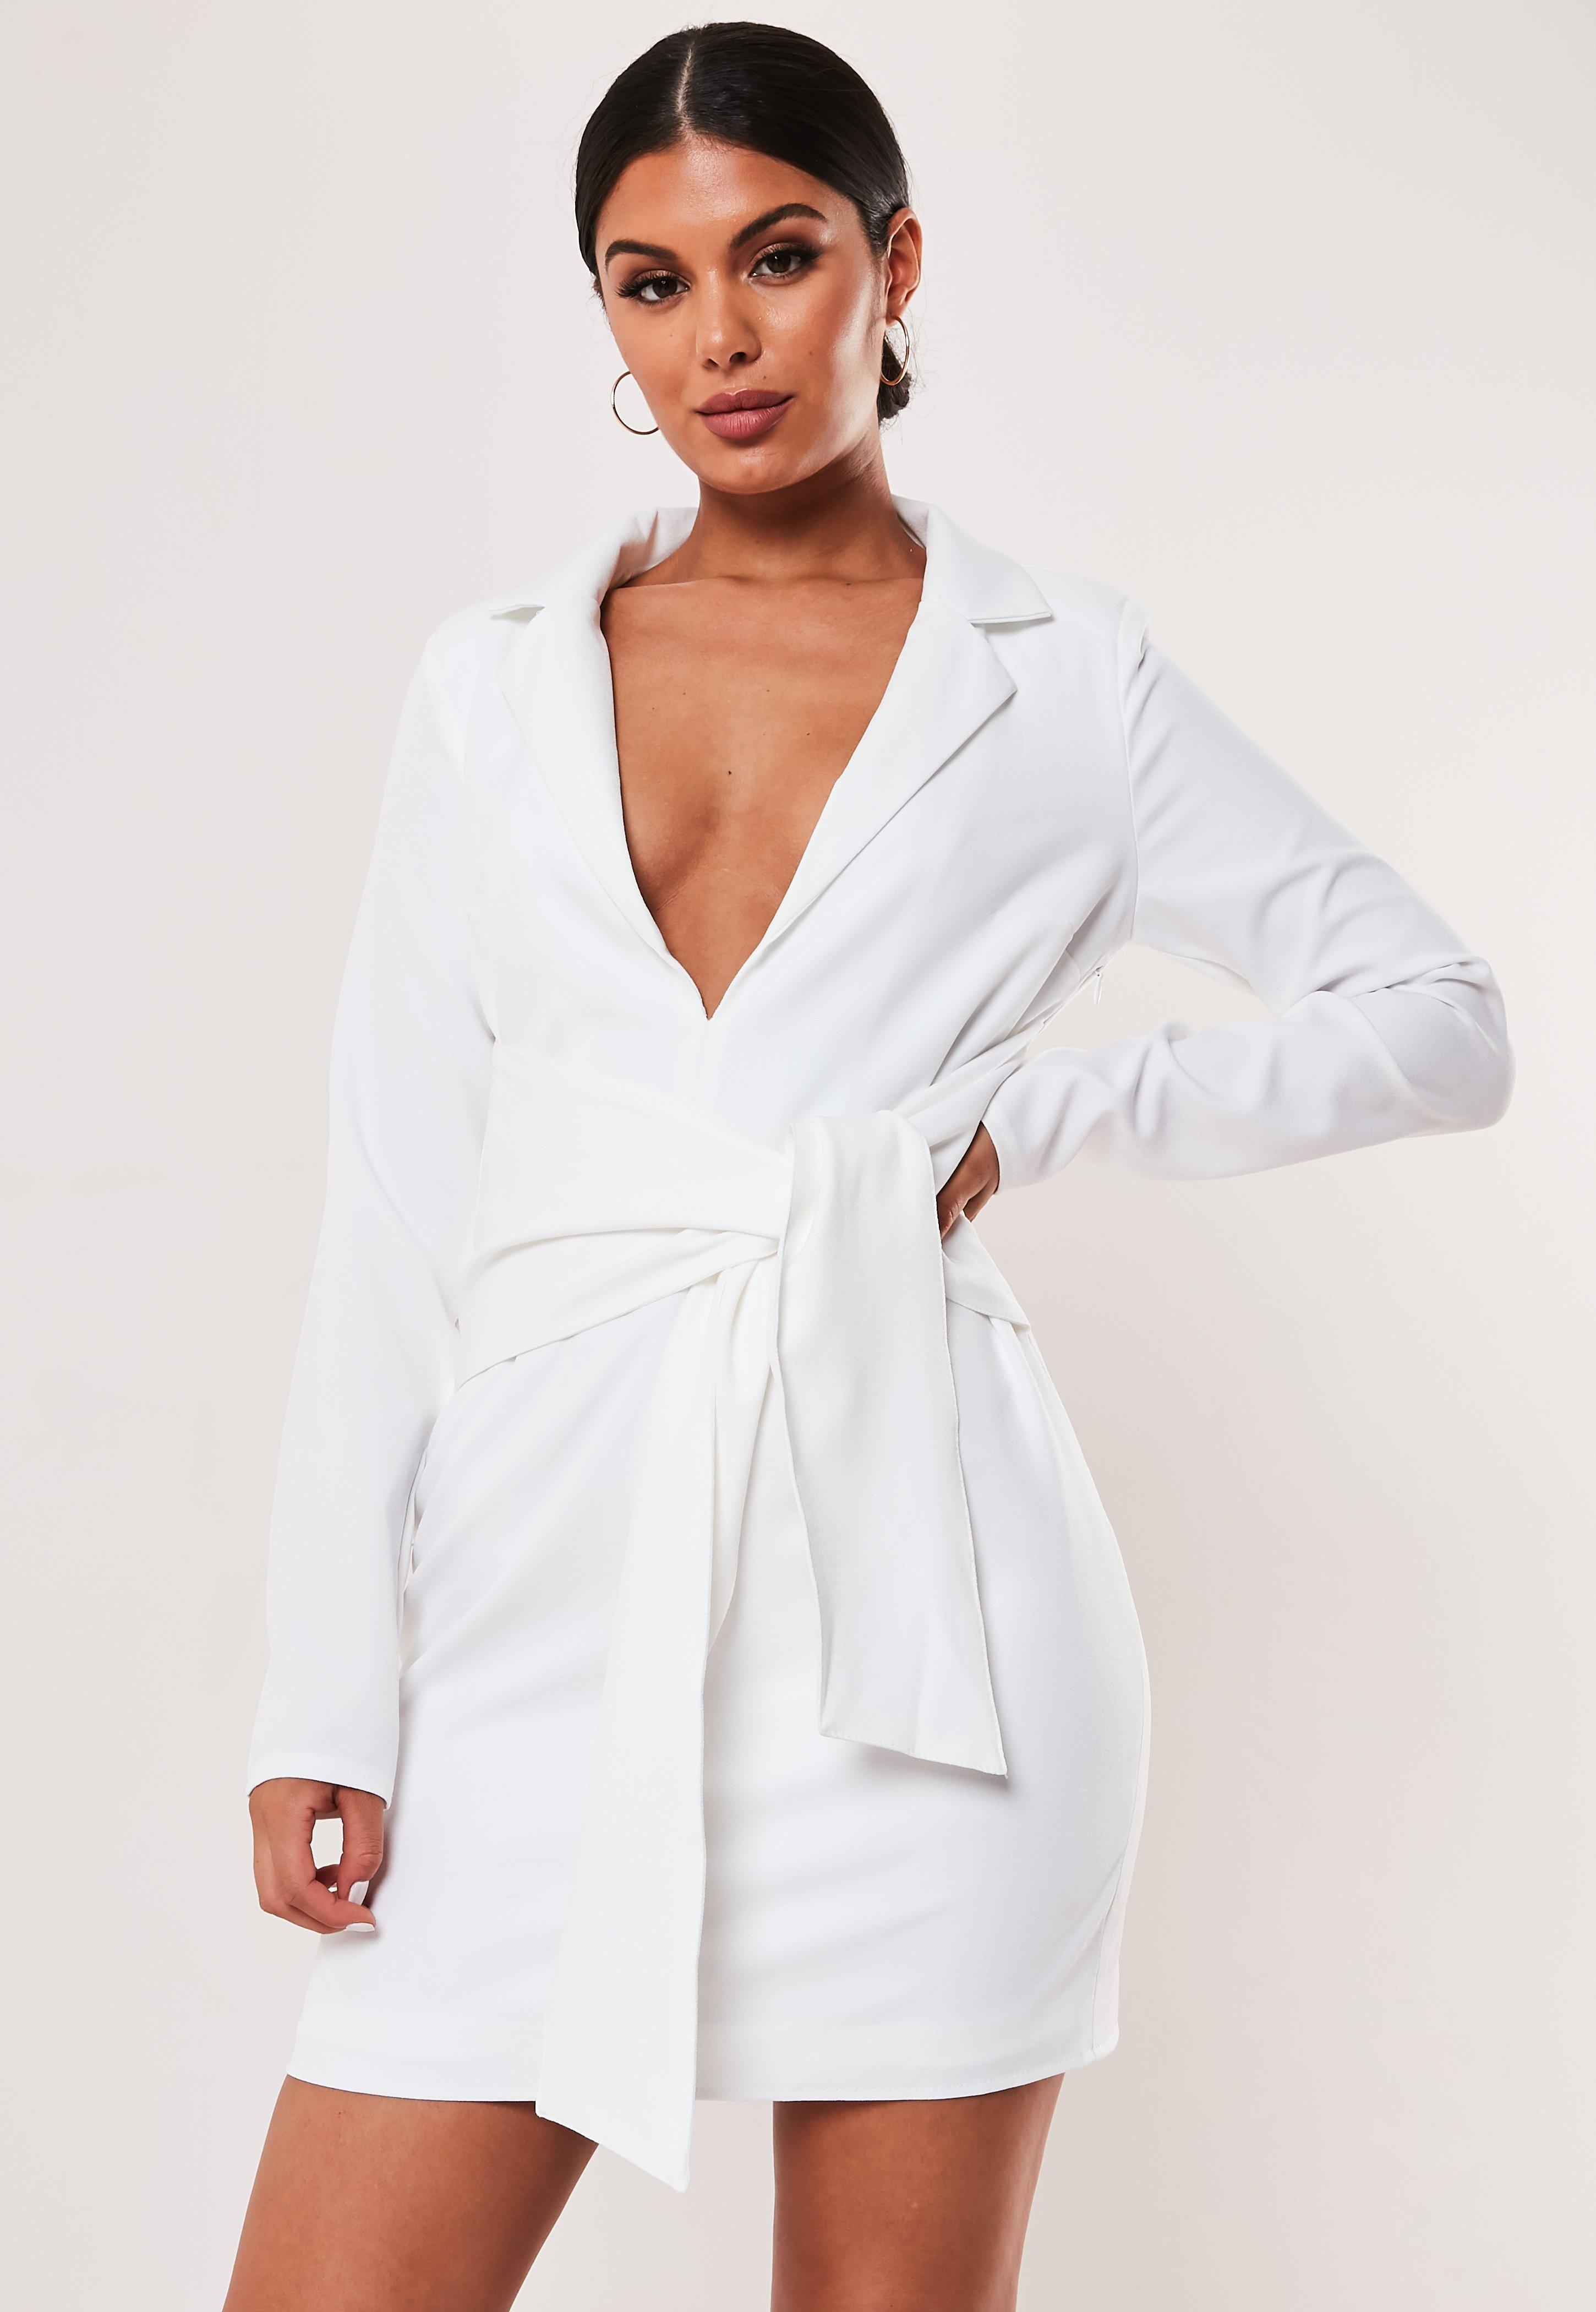 5d50535ed5f Blazer Dresses | Shop Tuxedo Dresses - Missguided